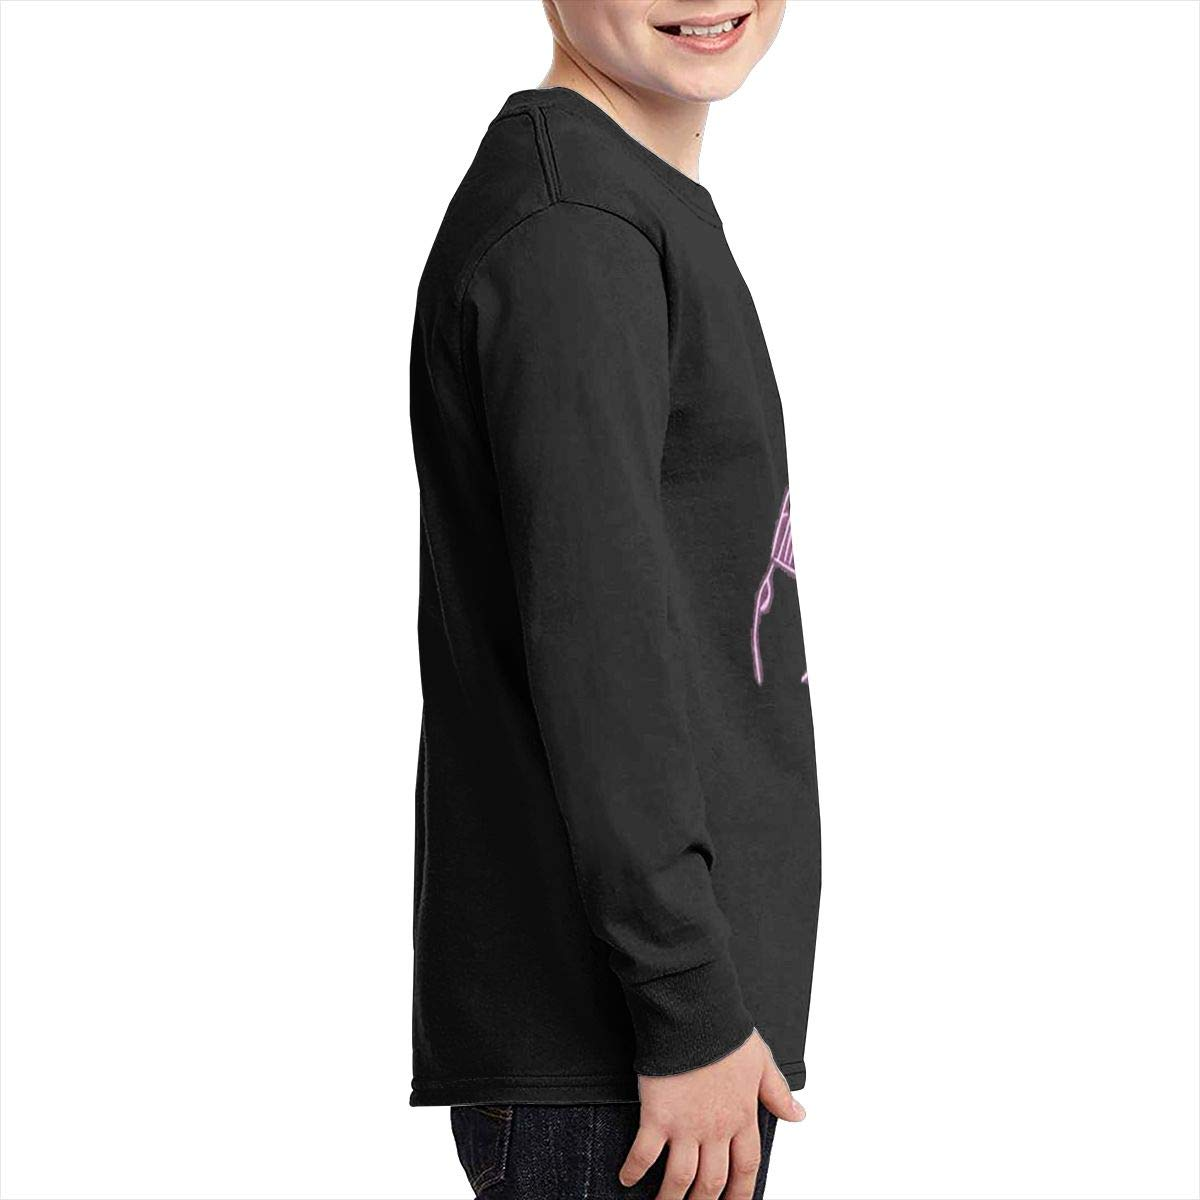 Youth Troye My-Si-Van Long Sleeves Shirt Boys Girls